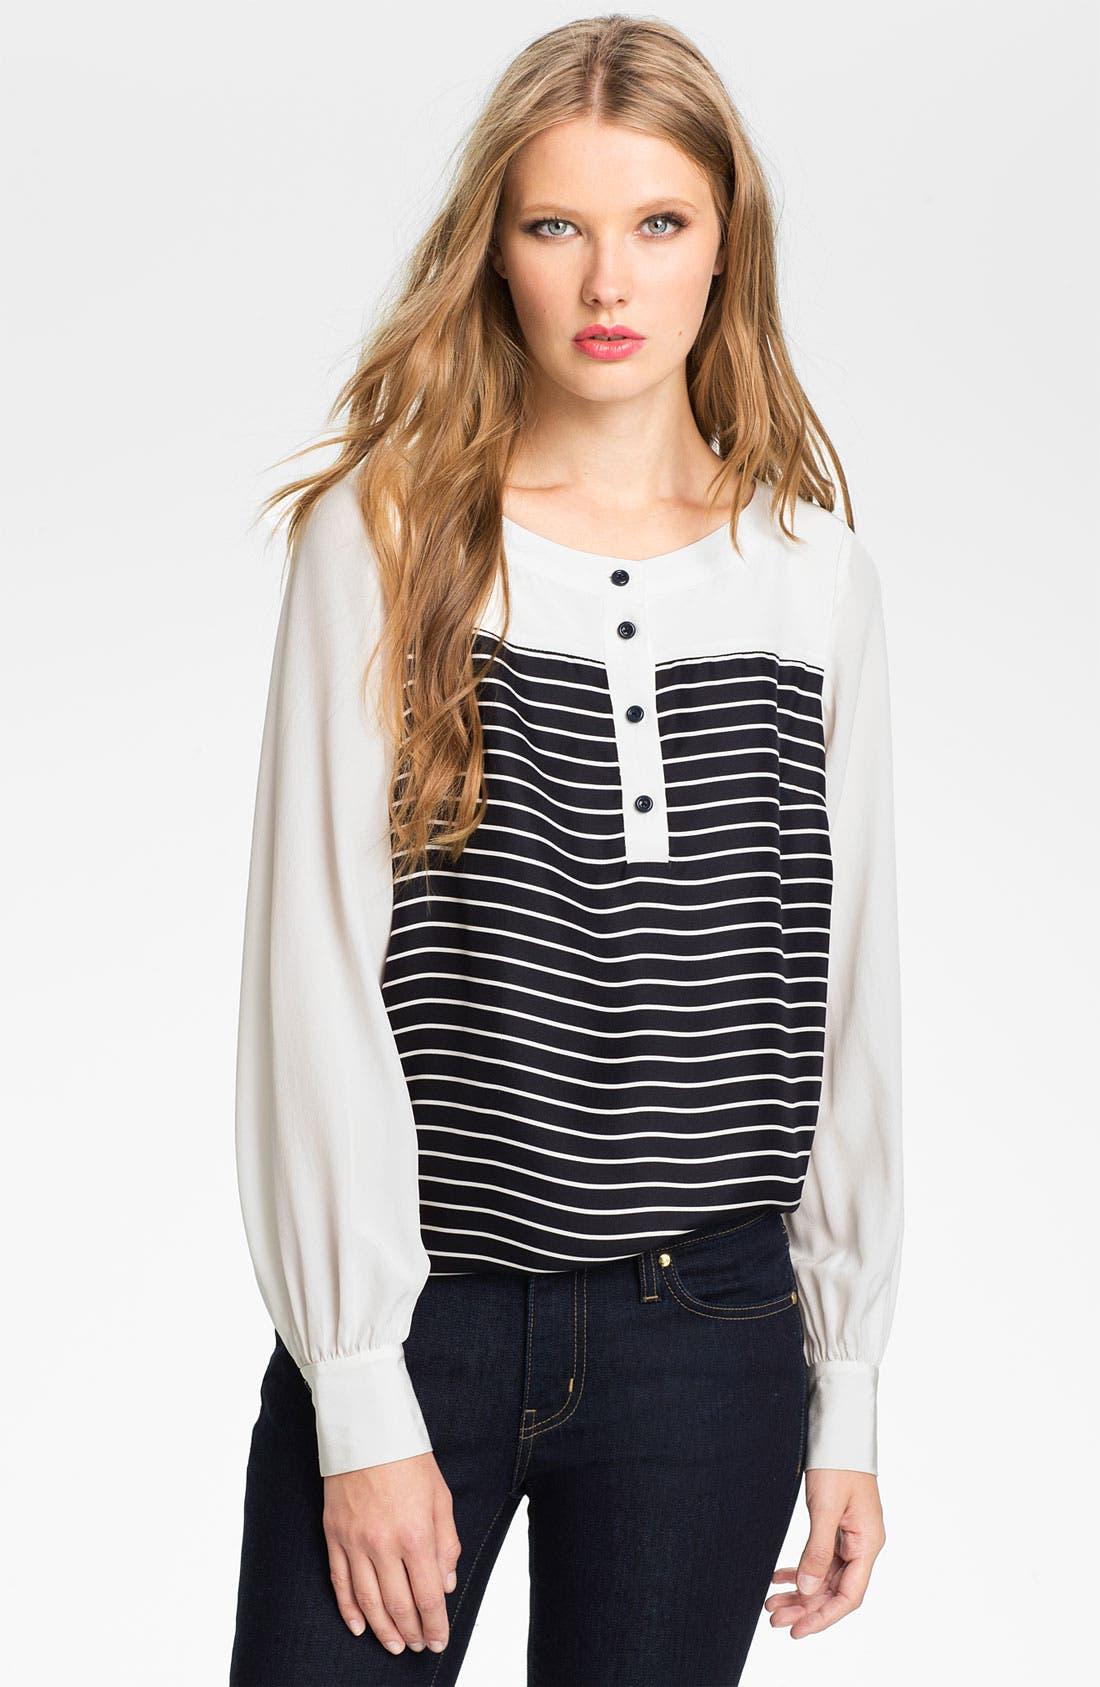 Alternate Image 1 Selected - kate spade new york 'leanne' silk blouse